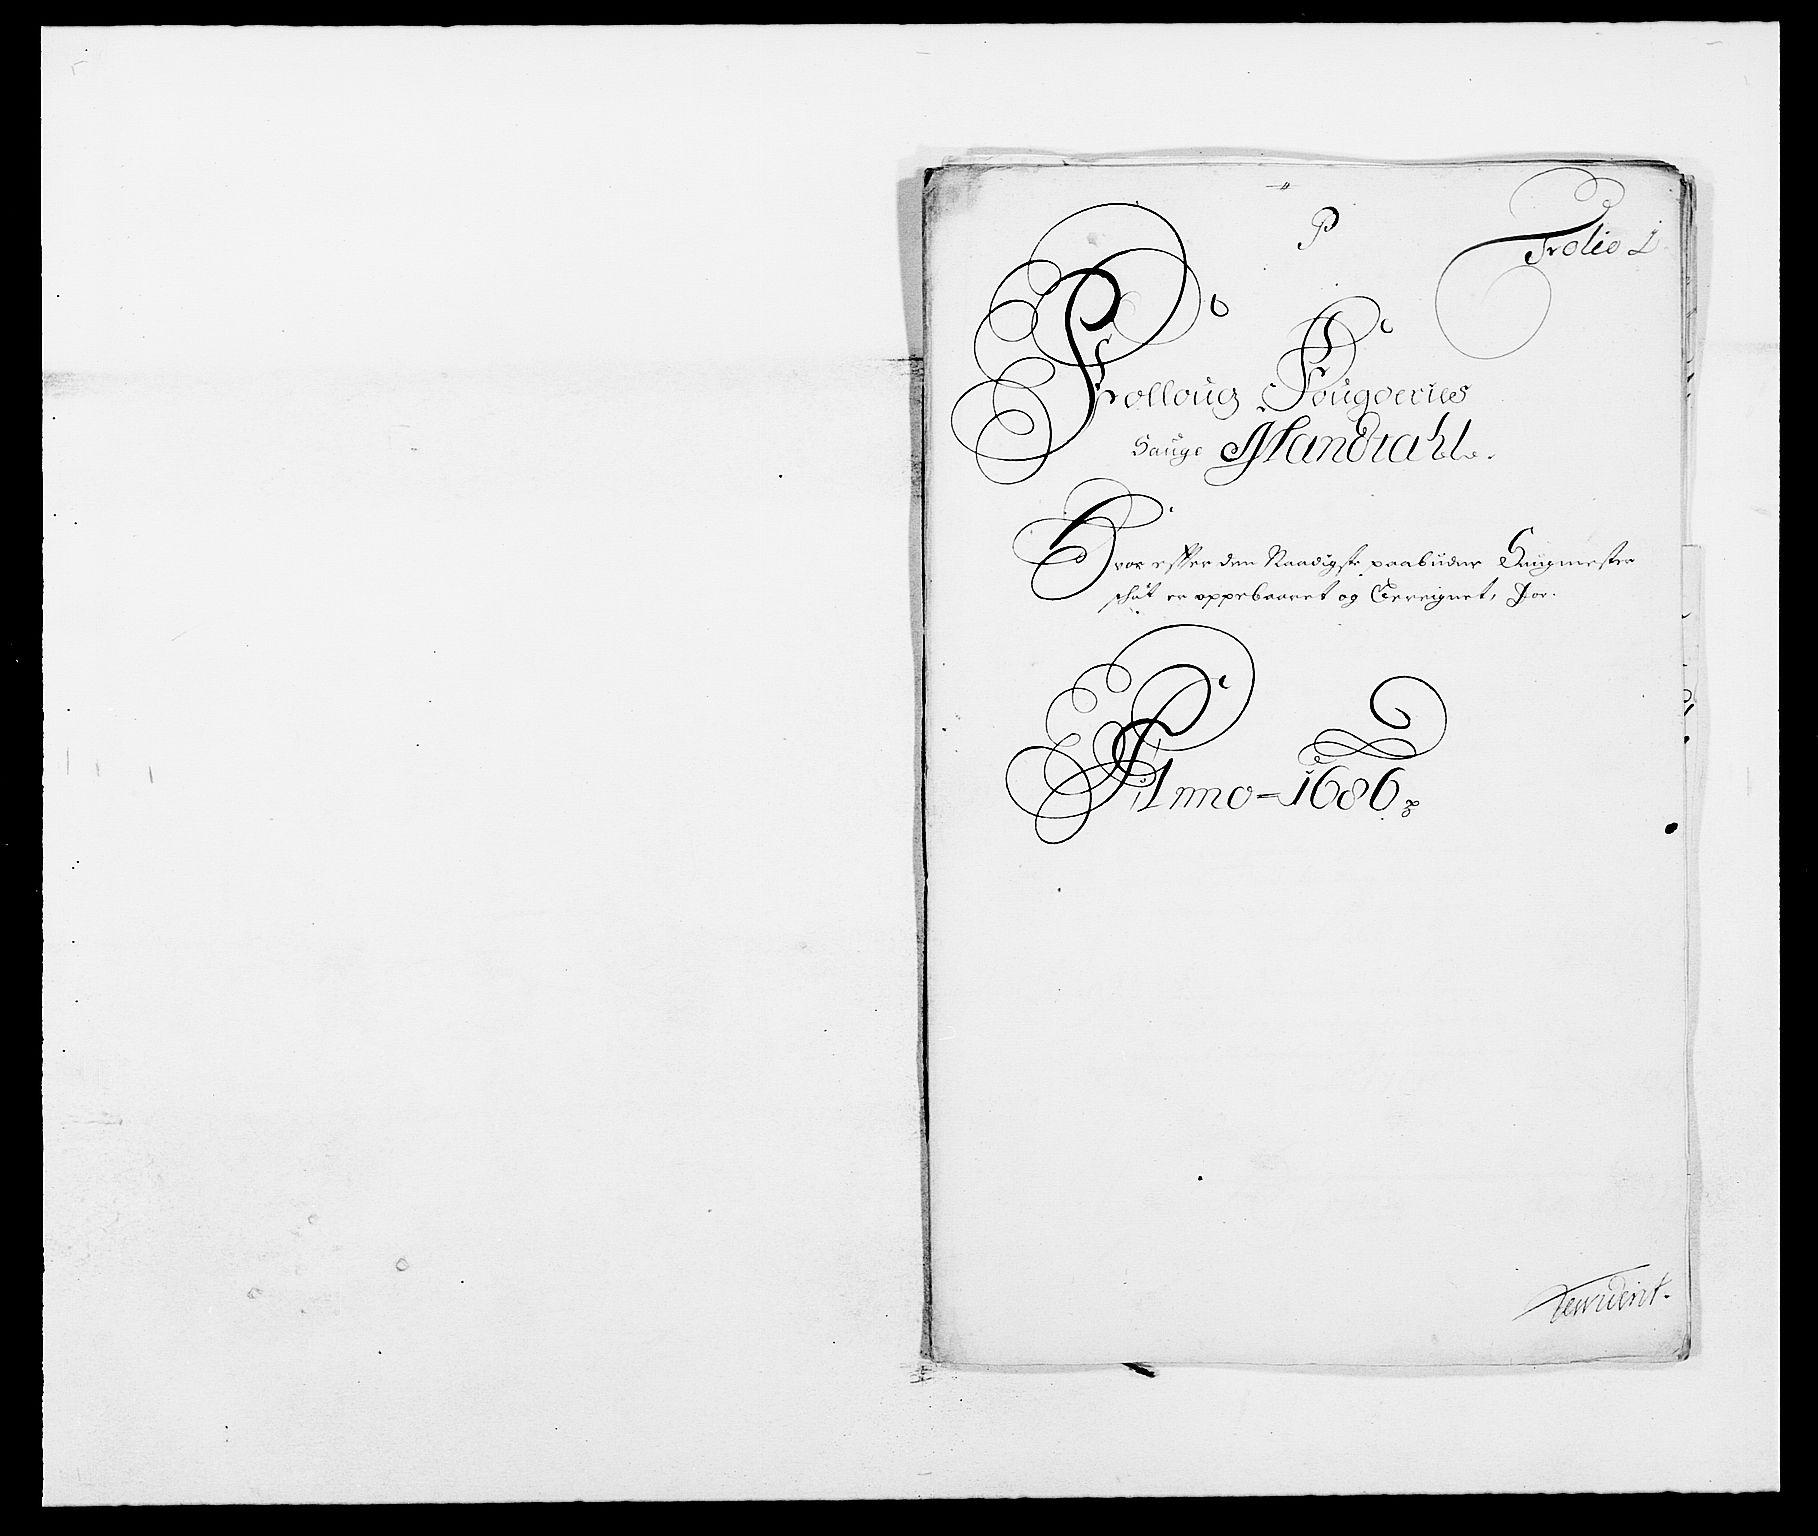 RA, Rentekammeret inntil 1814, Reviderte regnskaper, Fogderegnskap, R09/L0433: Fogderegnskap Follo, 1685-1686, s. 407